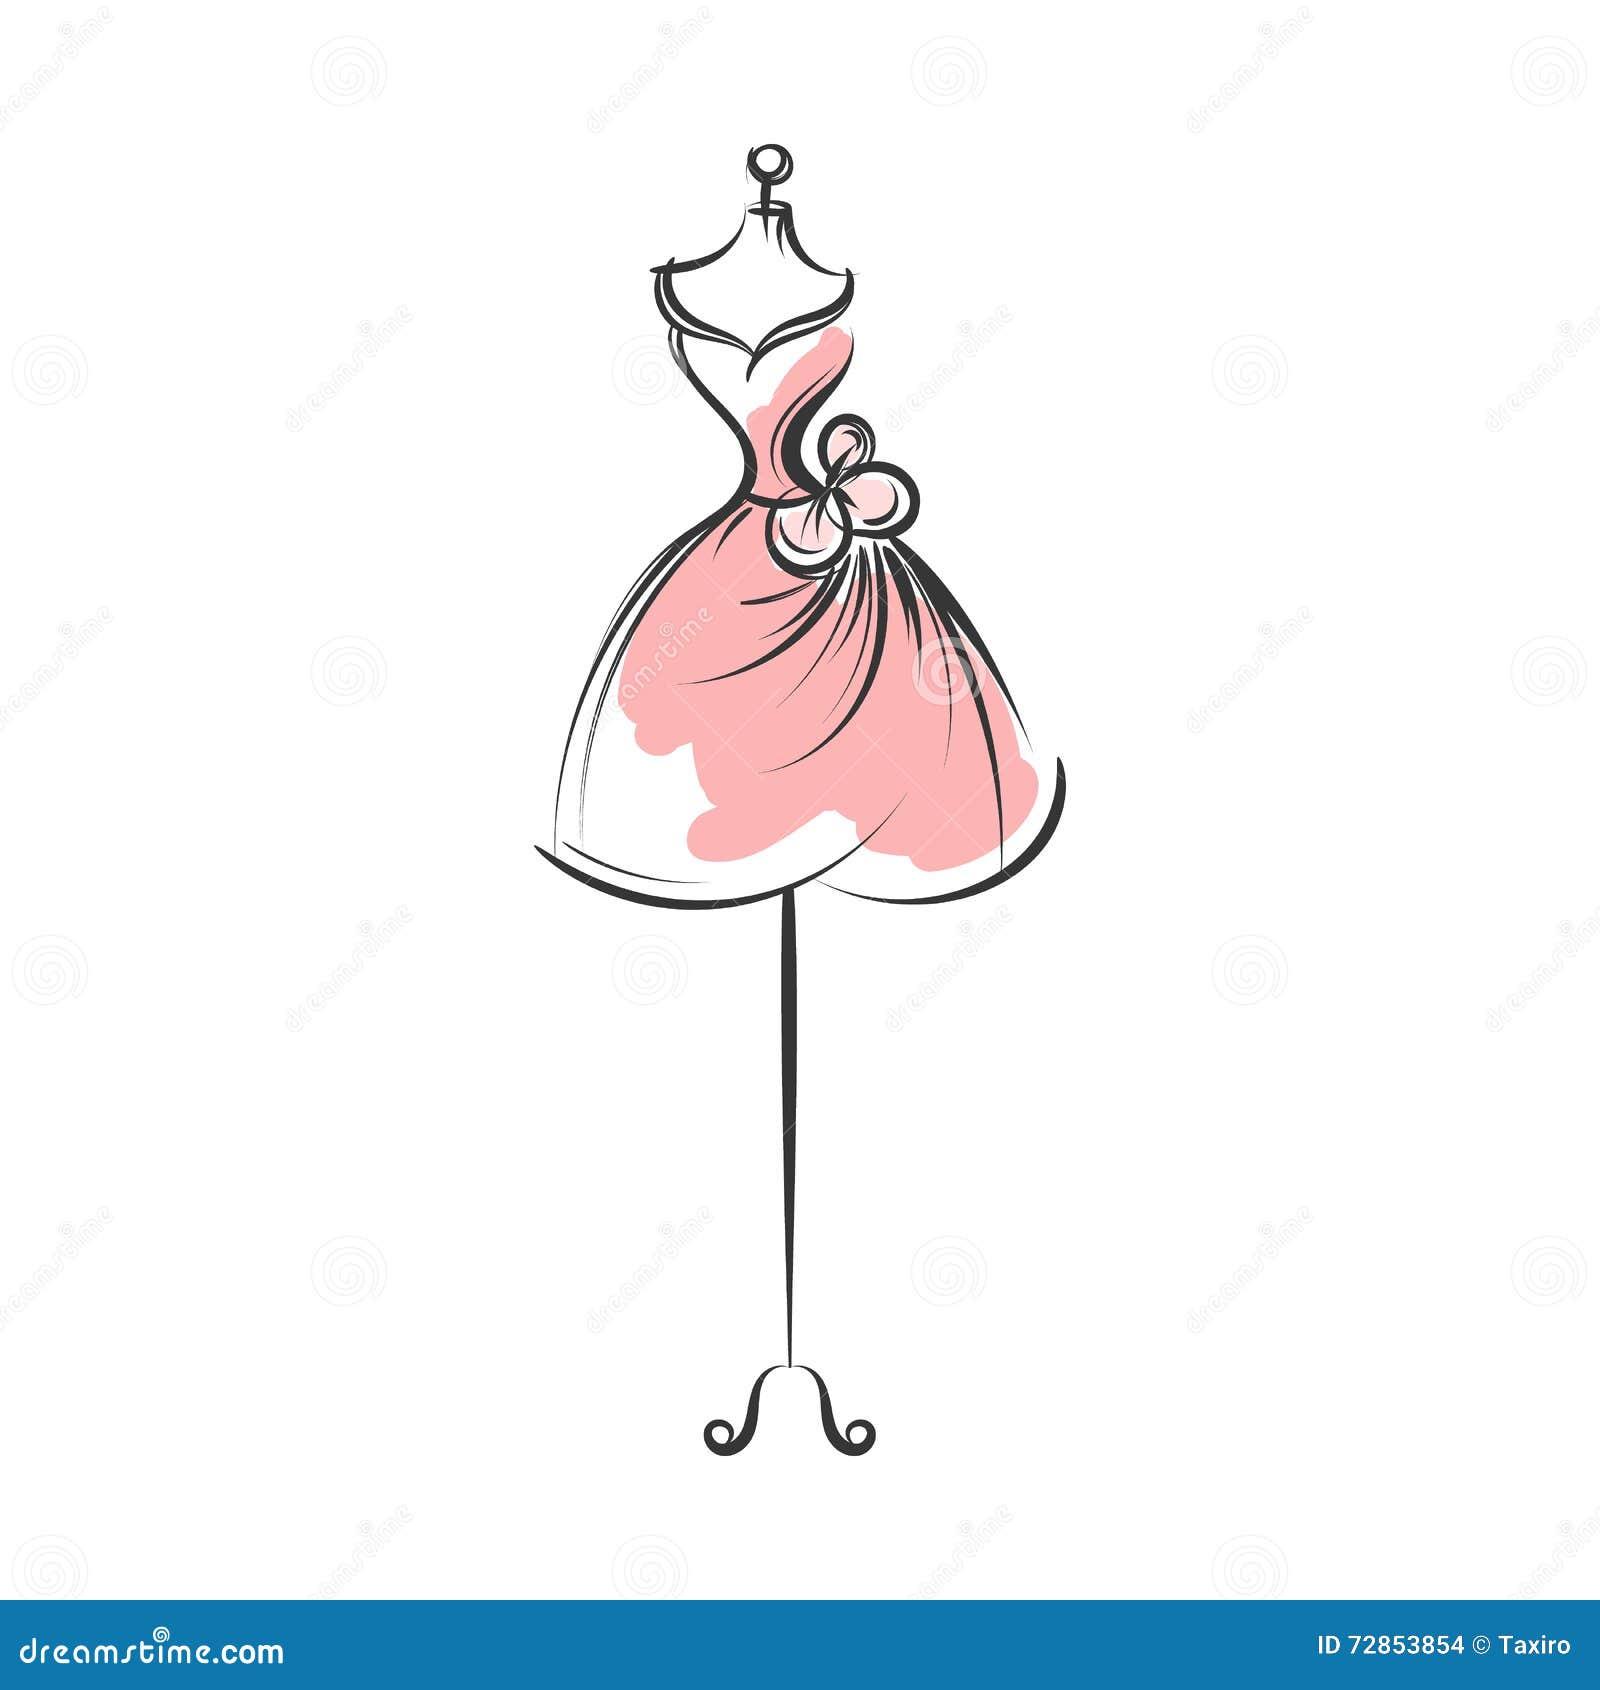 vetor da ilustra u00e7 u00e3o do desenho da m u00e3o do vestido do clip art ballerina free clip art ballerina slippers